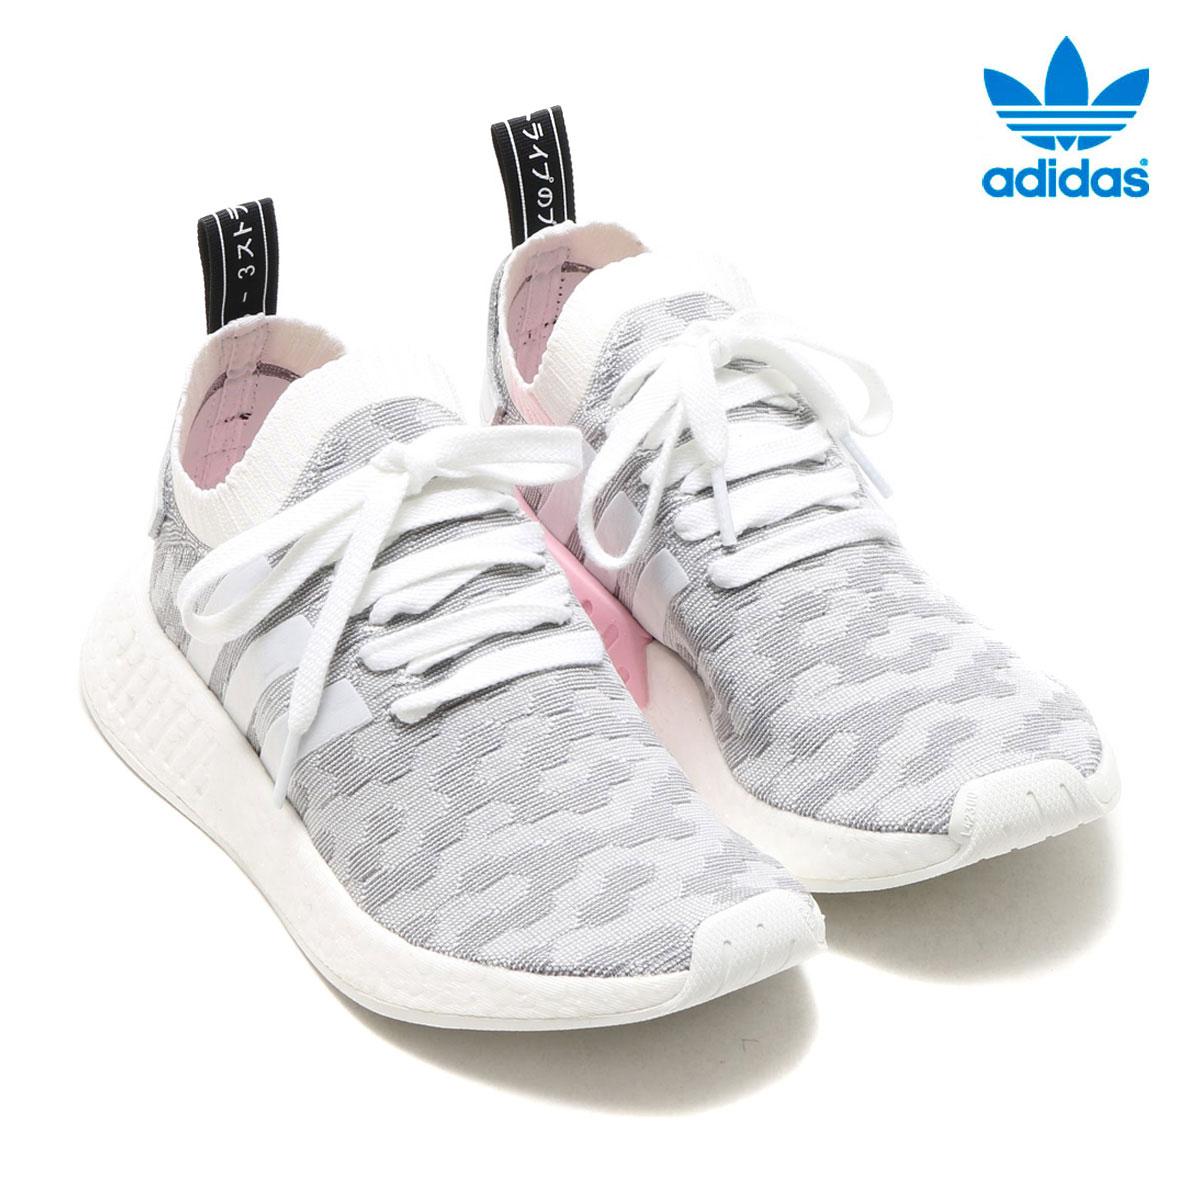 adidas nmd r2 pk w